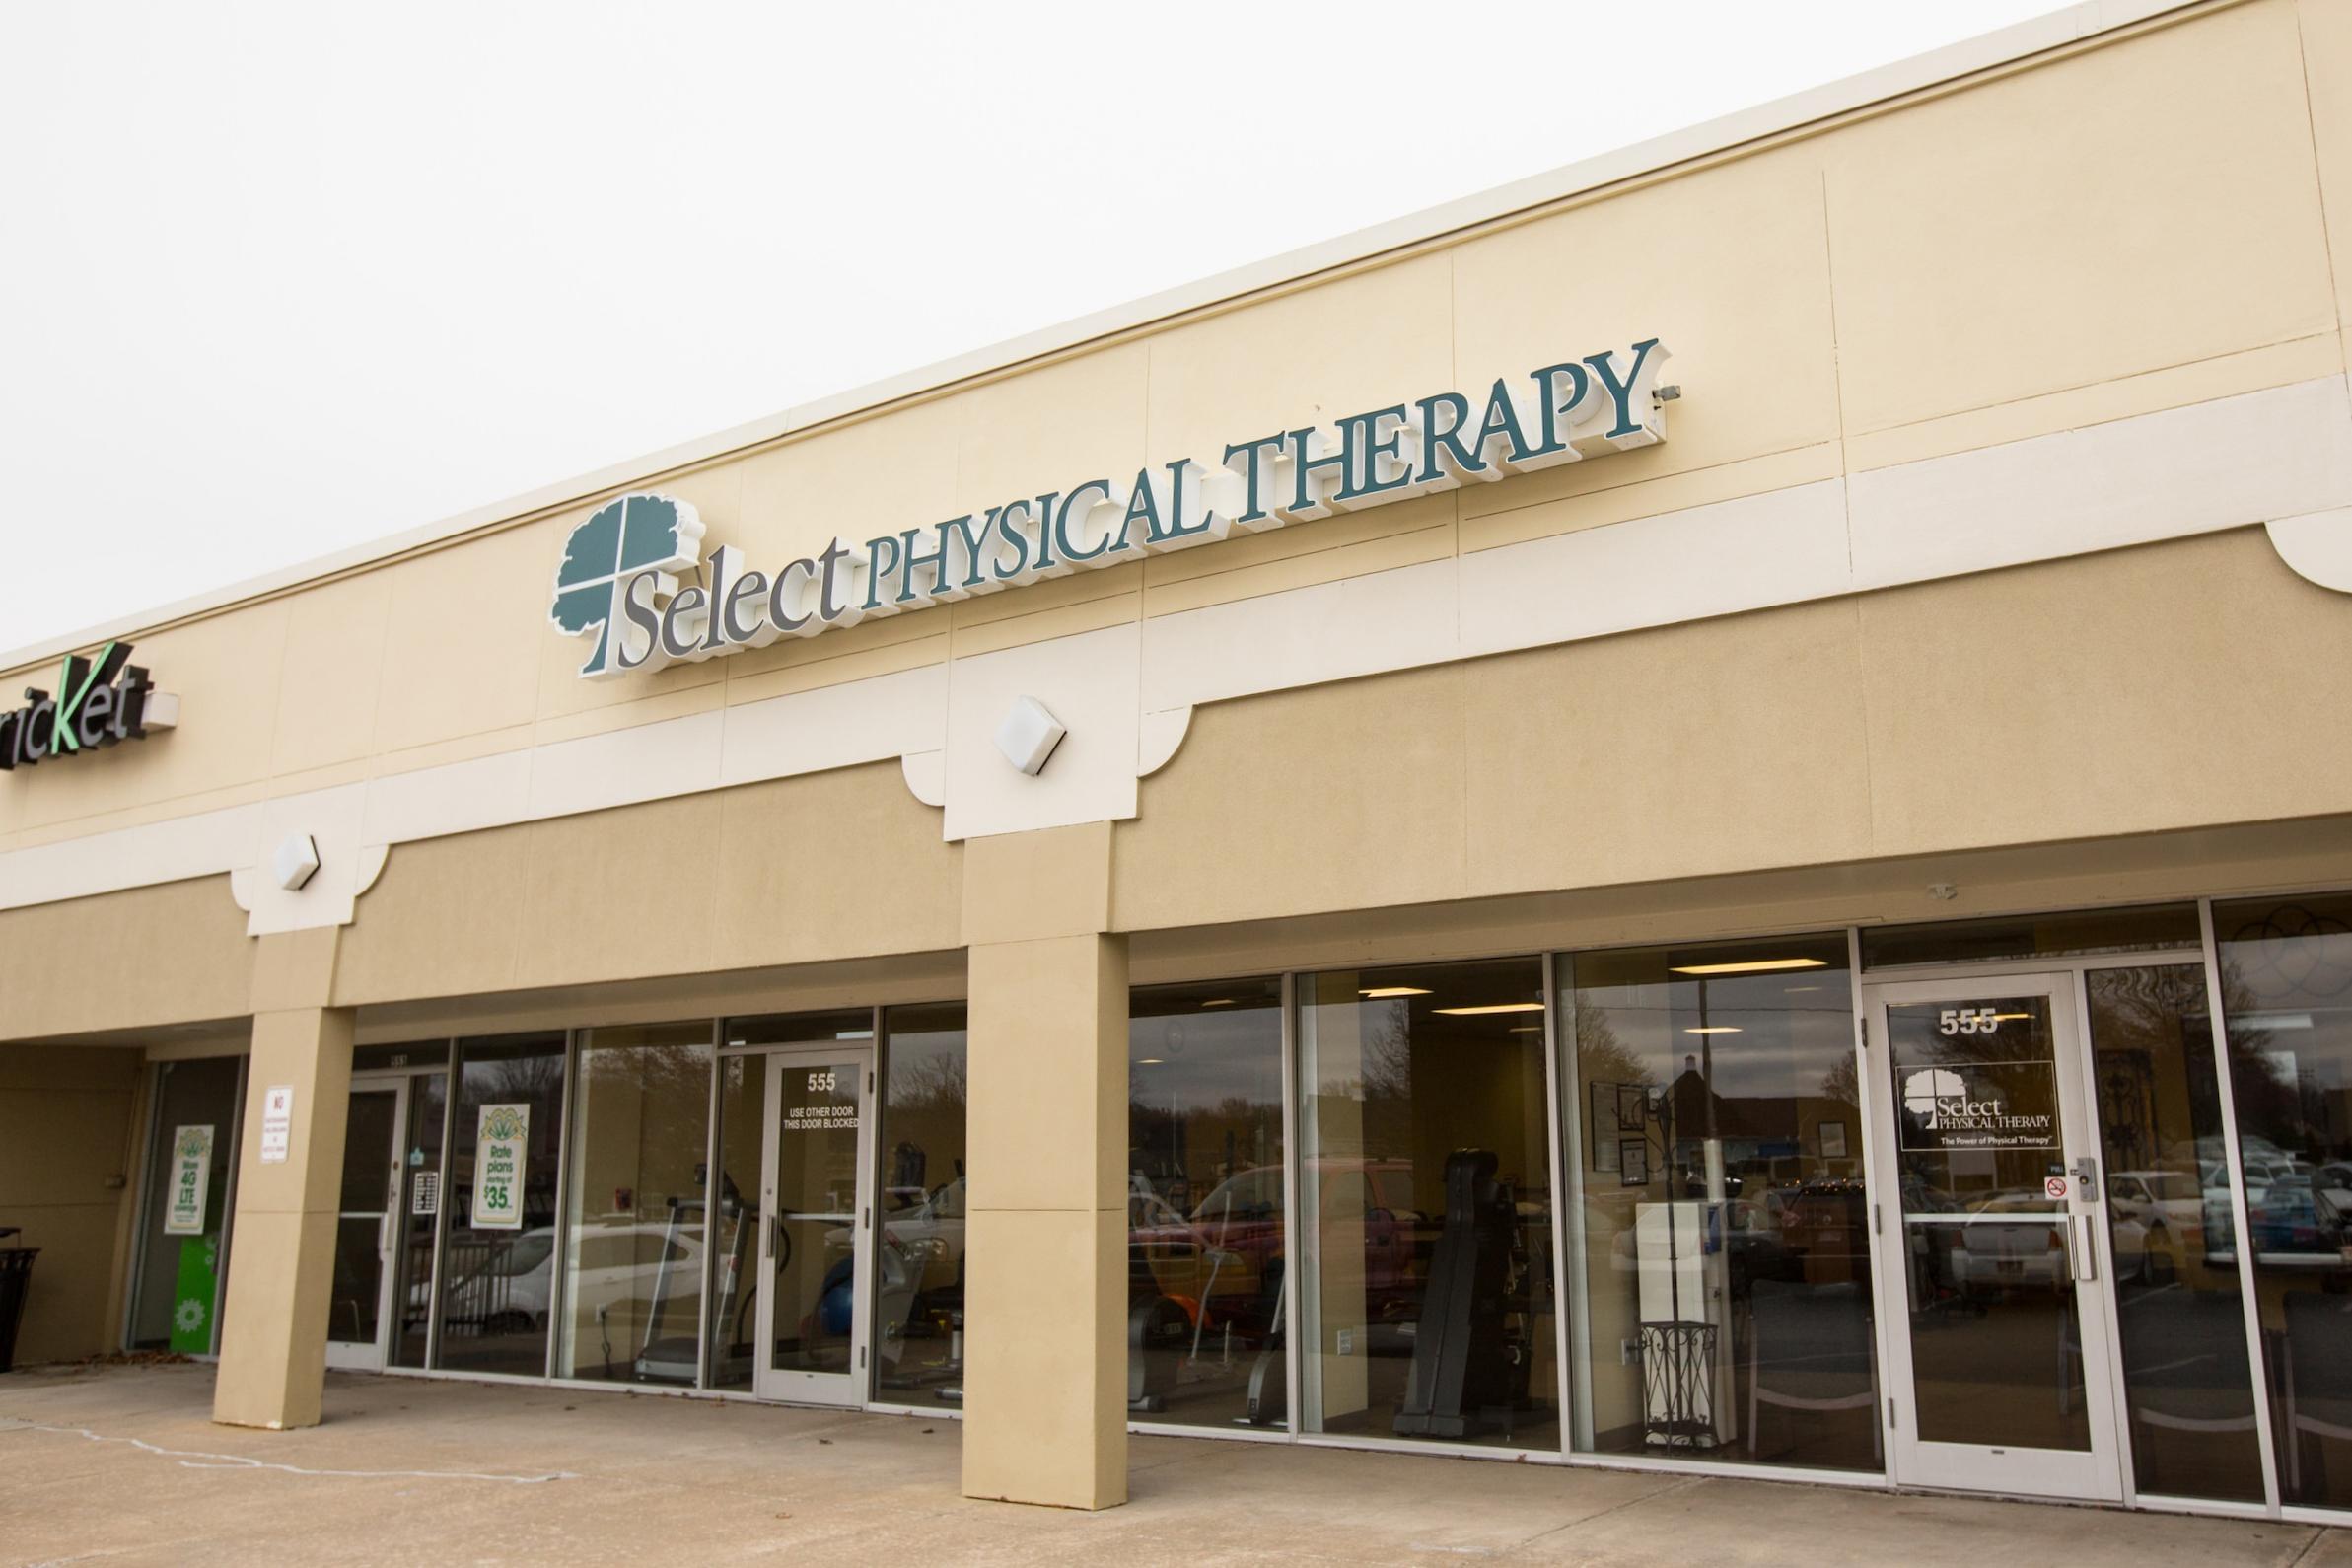 Exterior facade of Select Physical Therapy